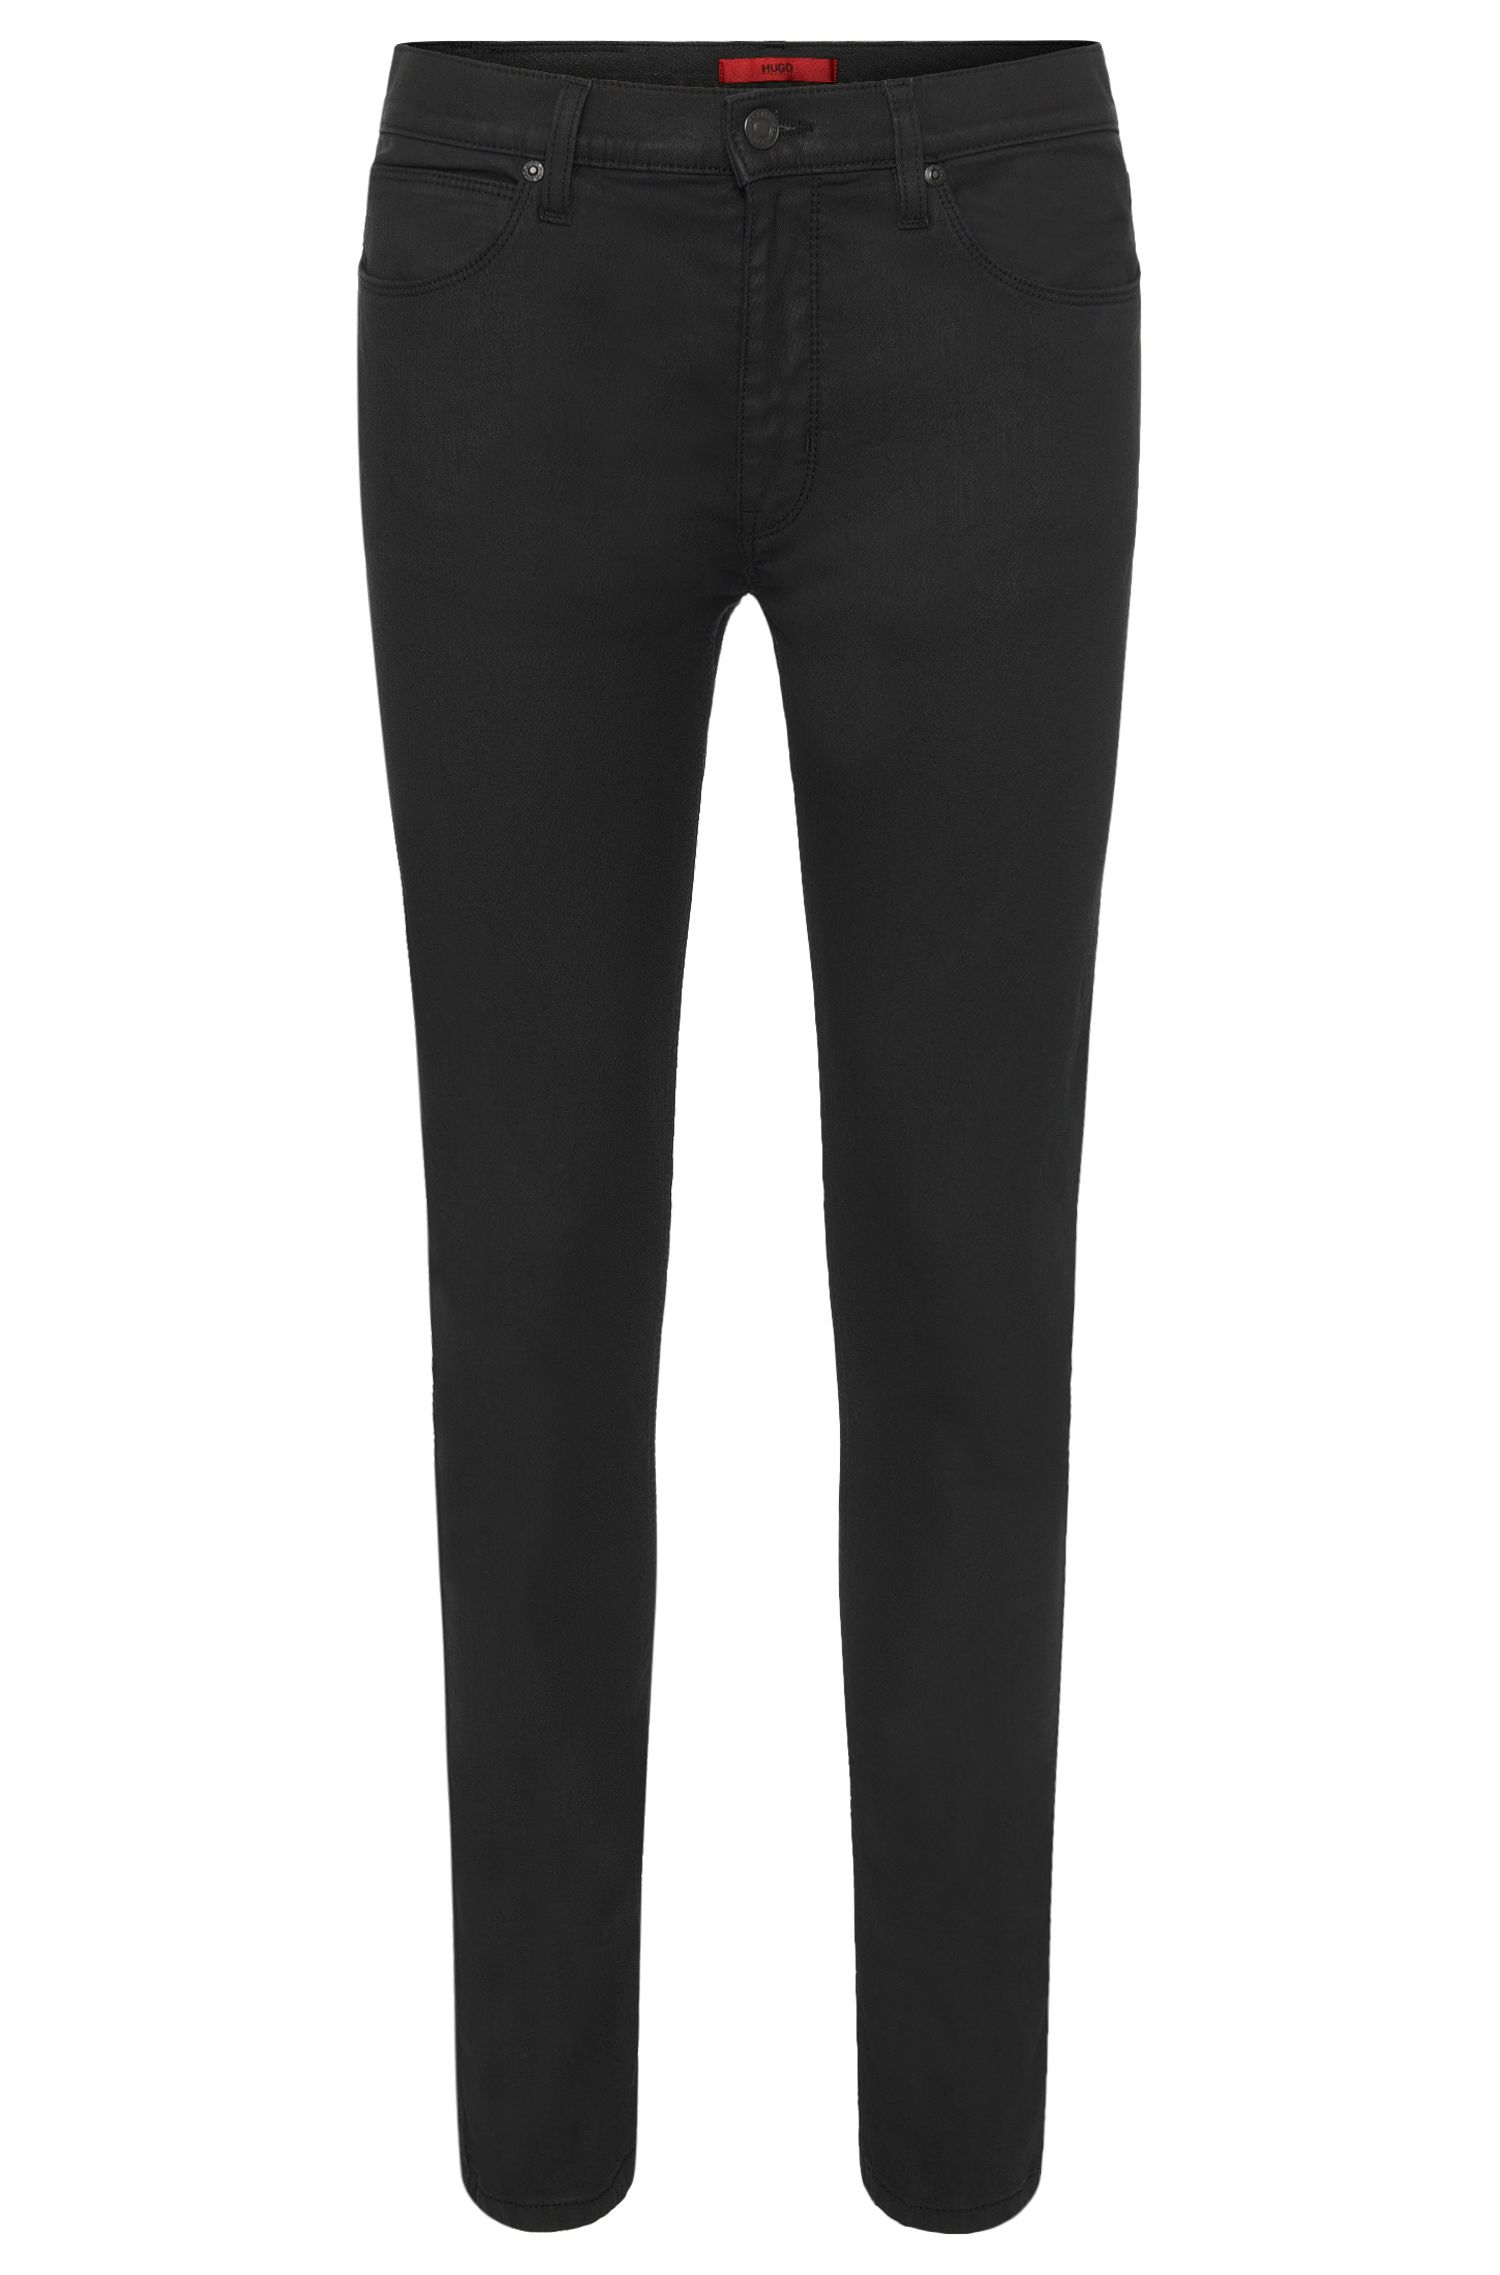 'HUGO 734' | Skinny Fit, 9 oz Stretch Cotton Blend Jeans